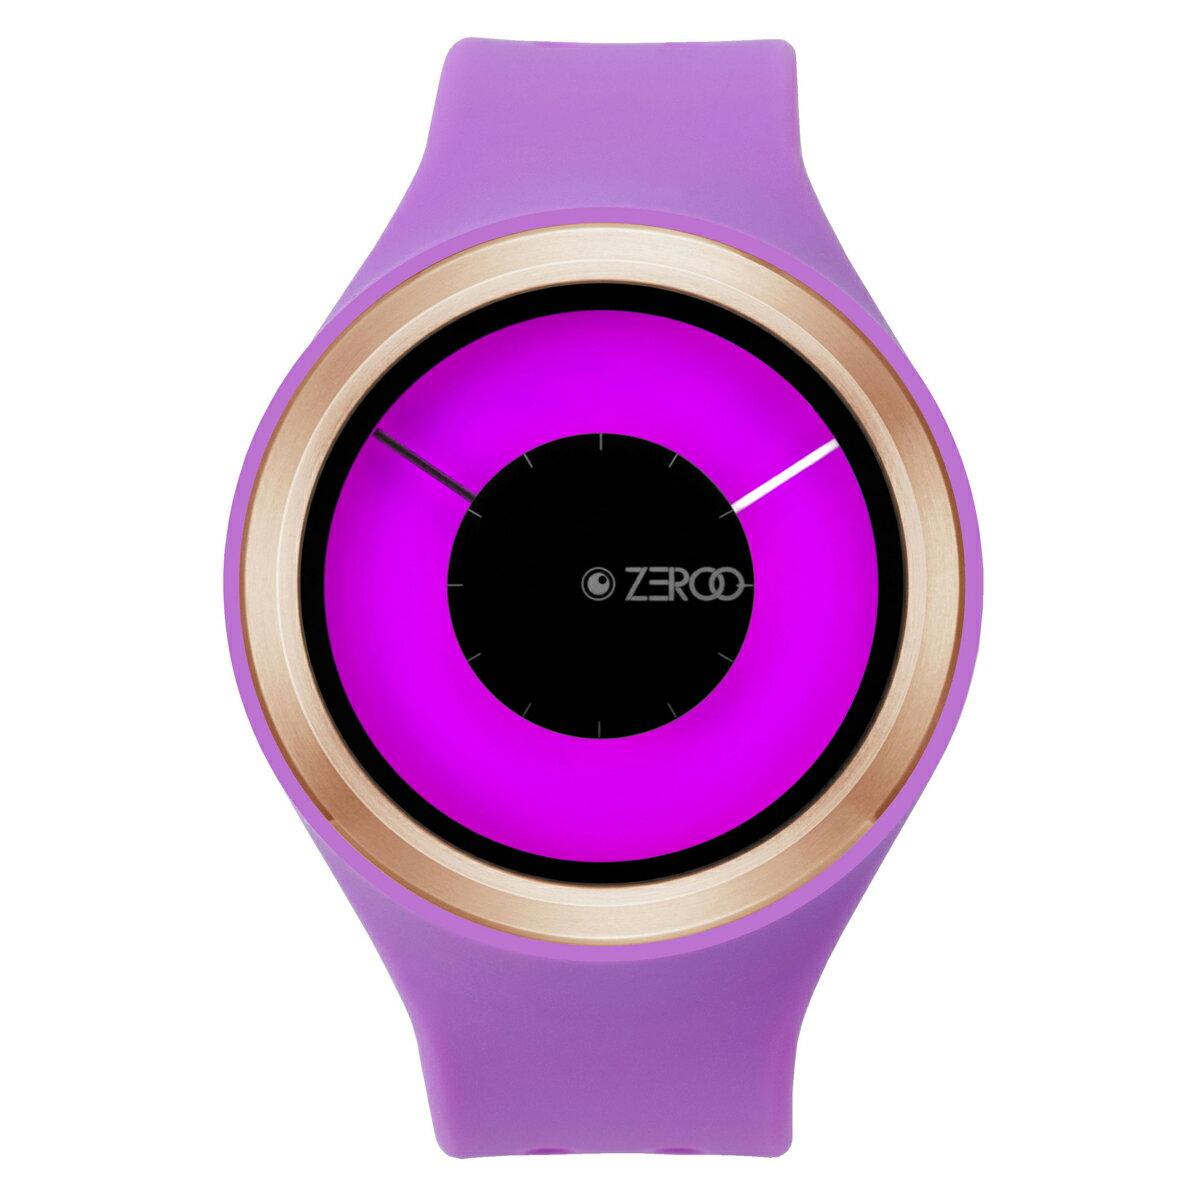 ZEROO MAGIA AURORA ゼロ 電池式クォーツ 腕時計 [W00801B05SR08] パープル デザインウォッチ ペア用 メンズ レディース ユニセックス おしゃれ時計 デザイナーズ